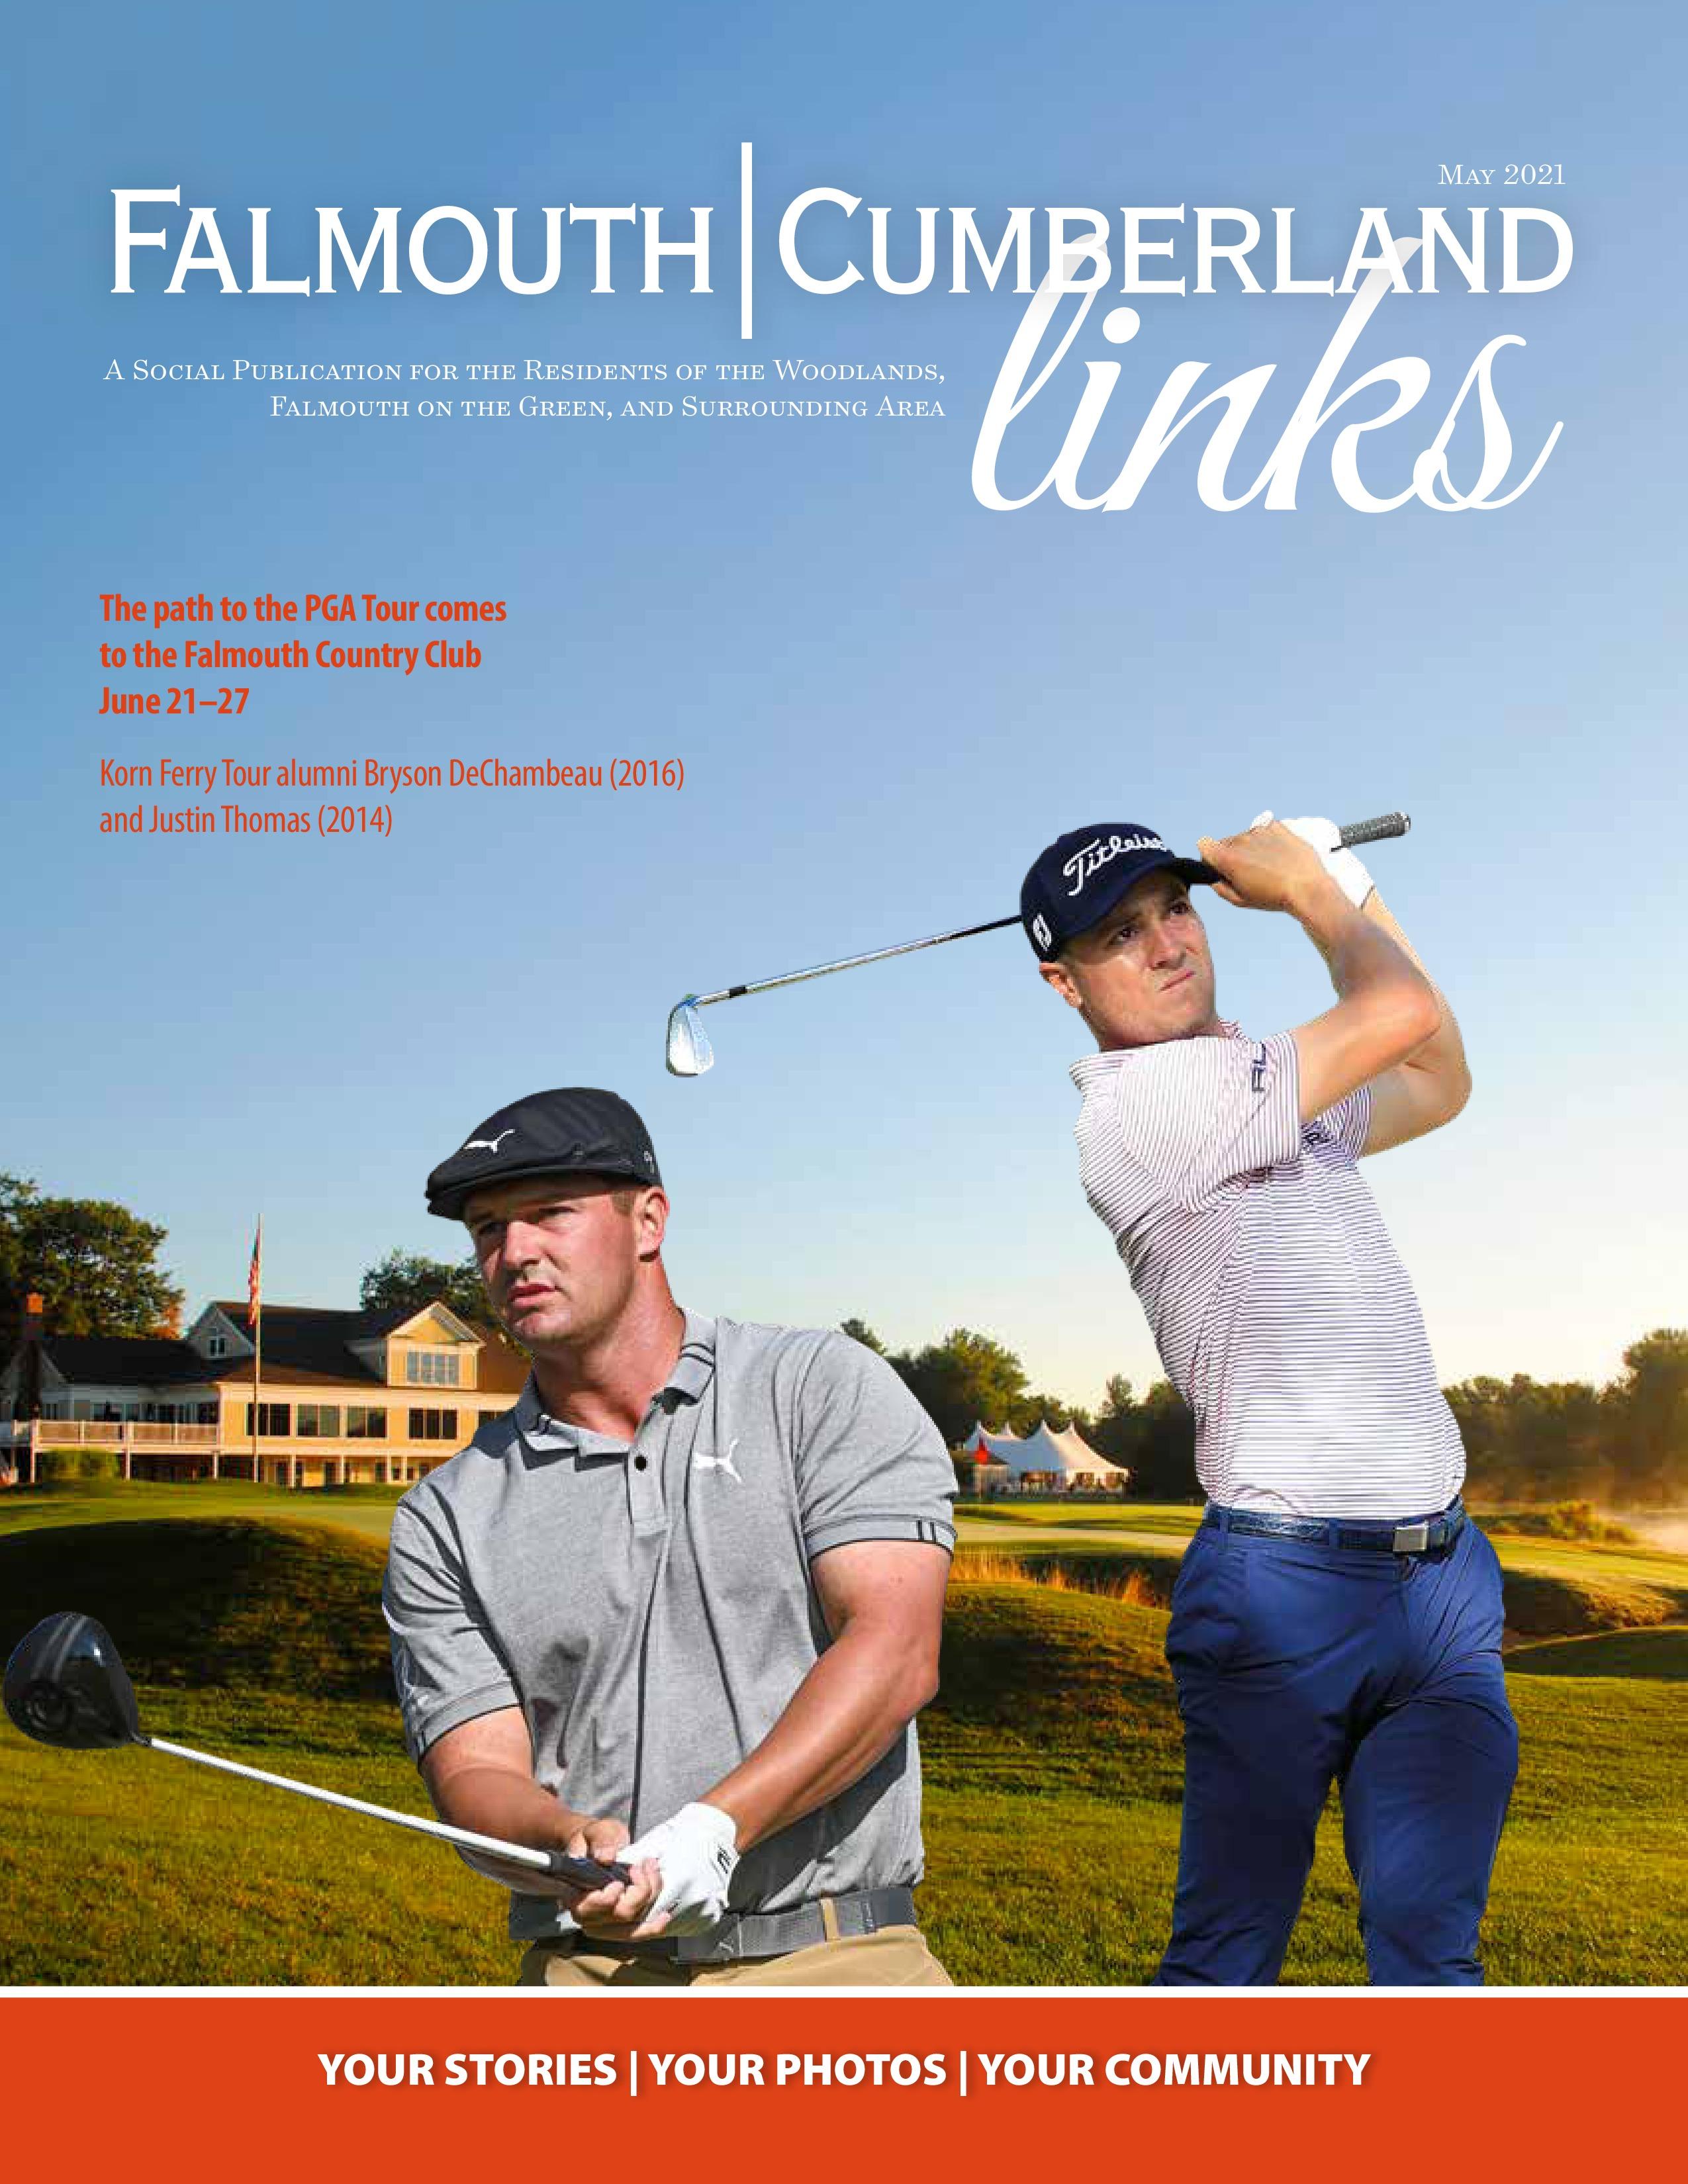 Falmouth Cumberland Links 2021-05-01